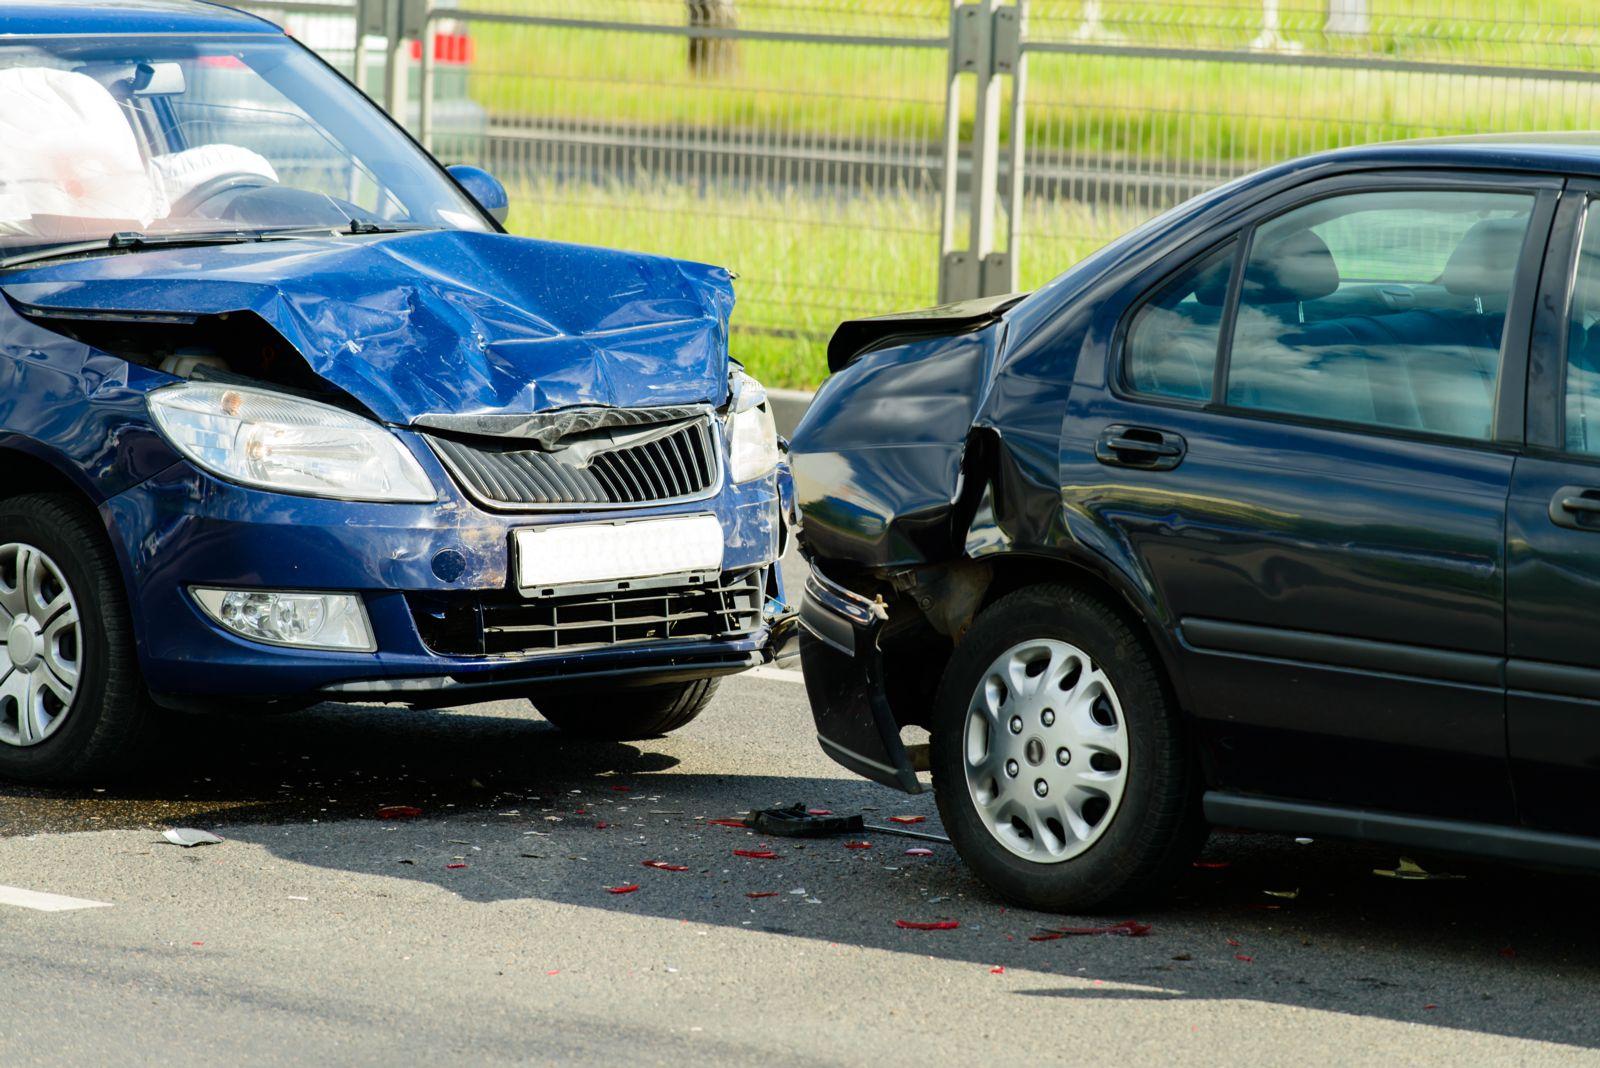 Rear end multiple car crash on street.